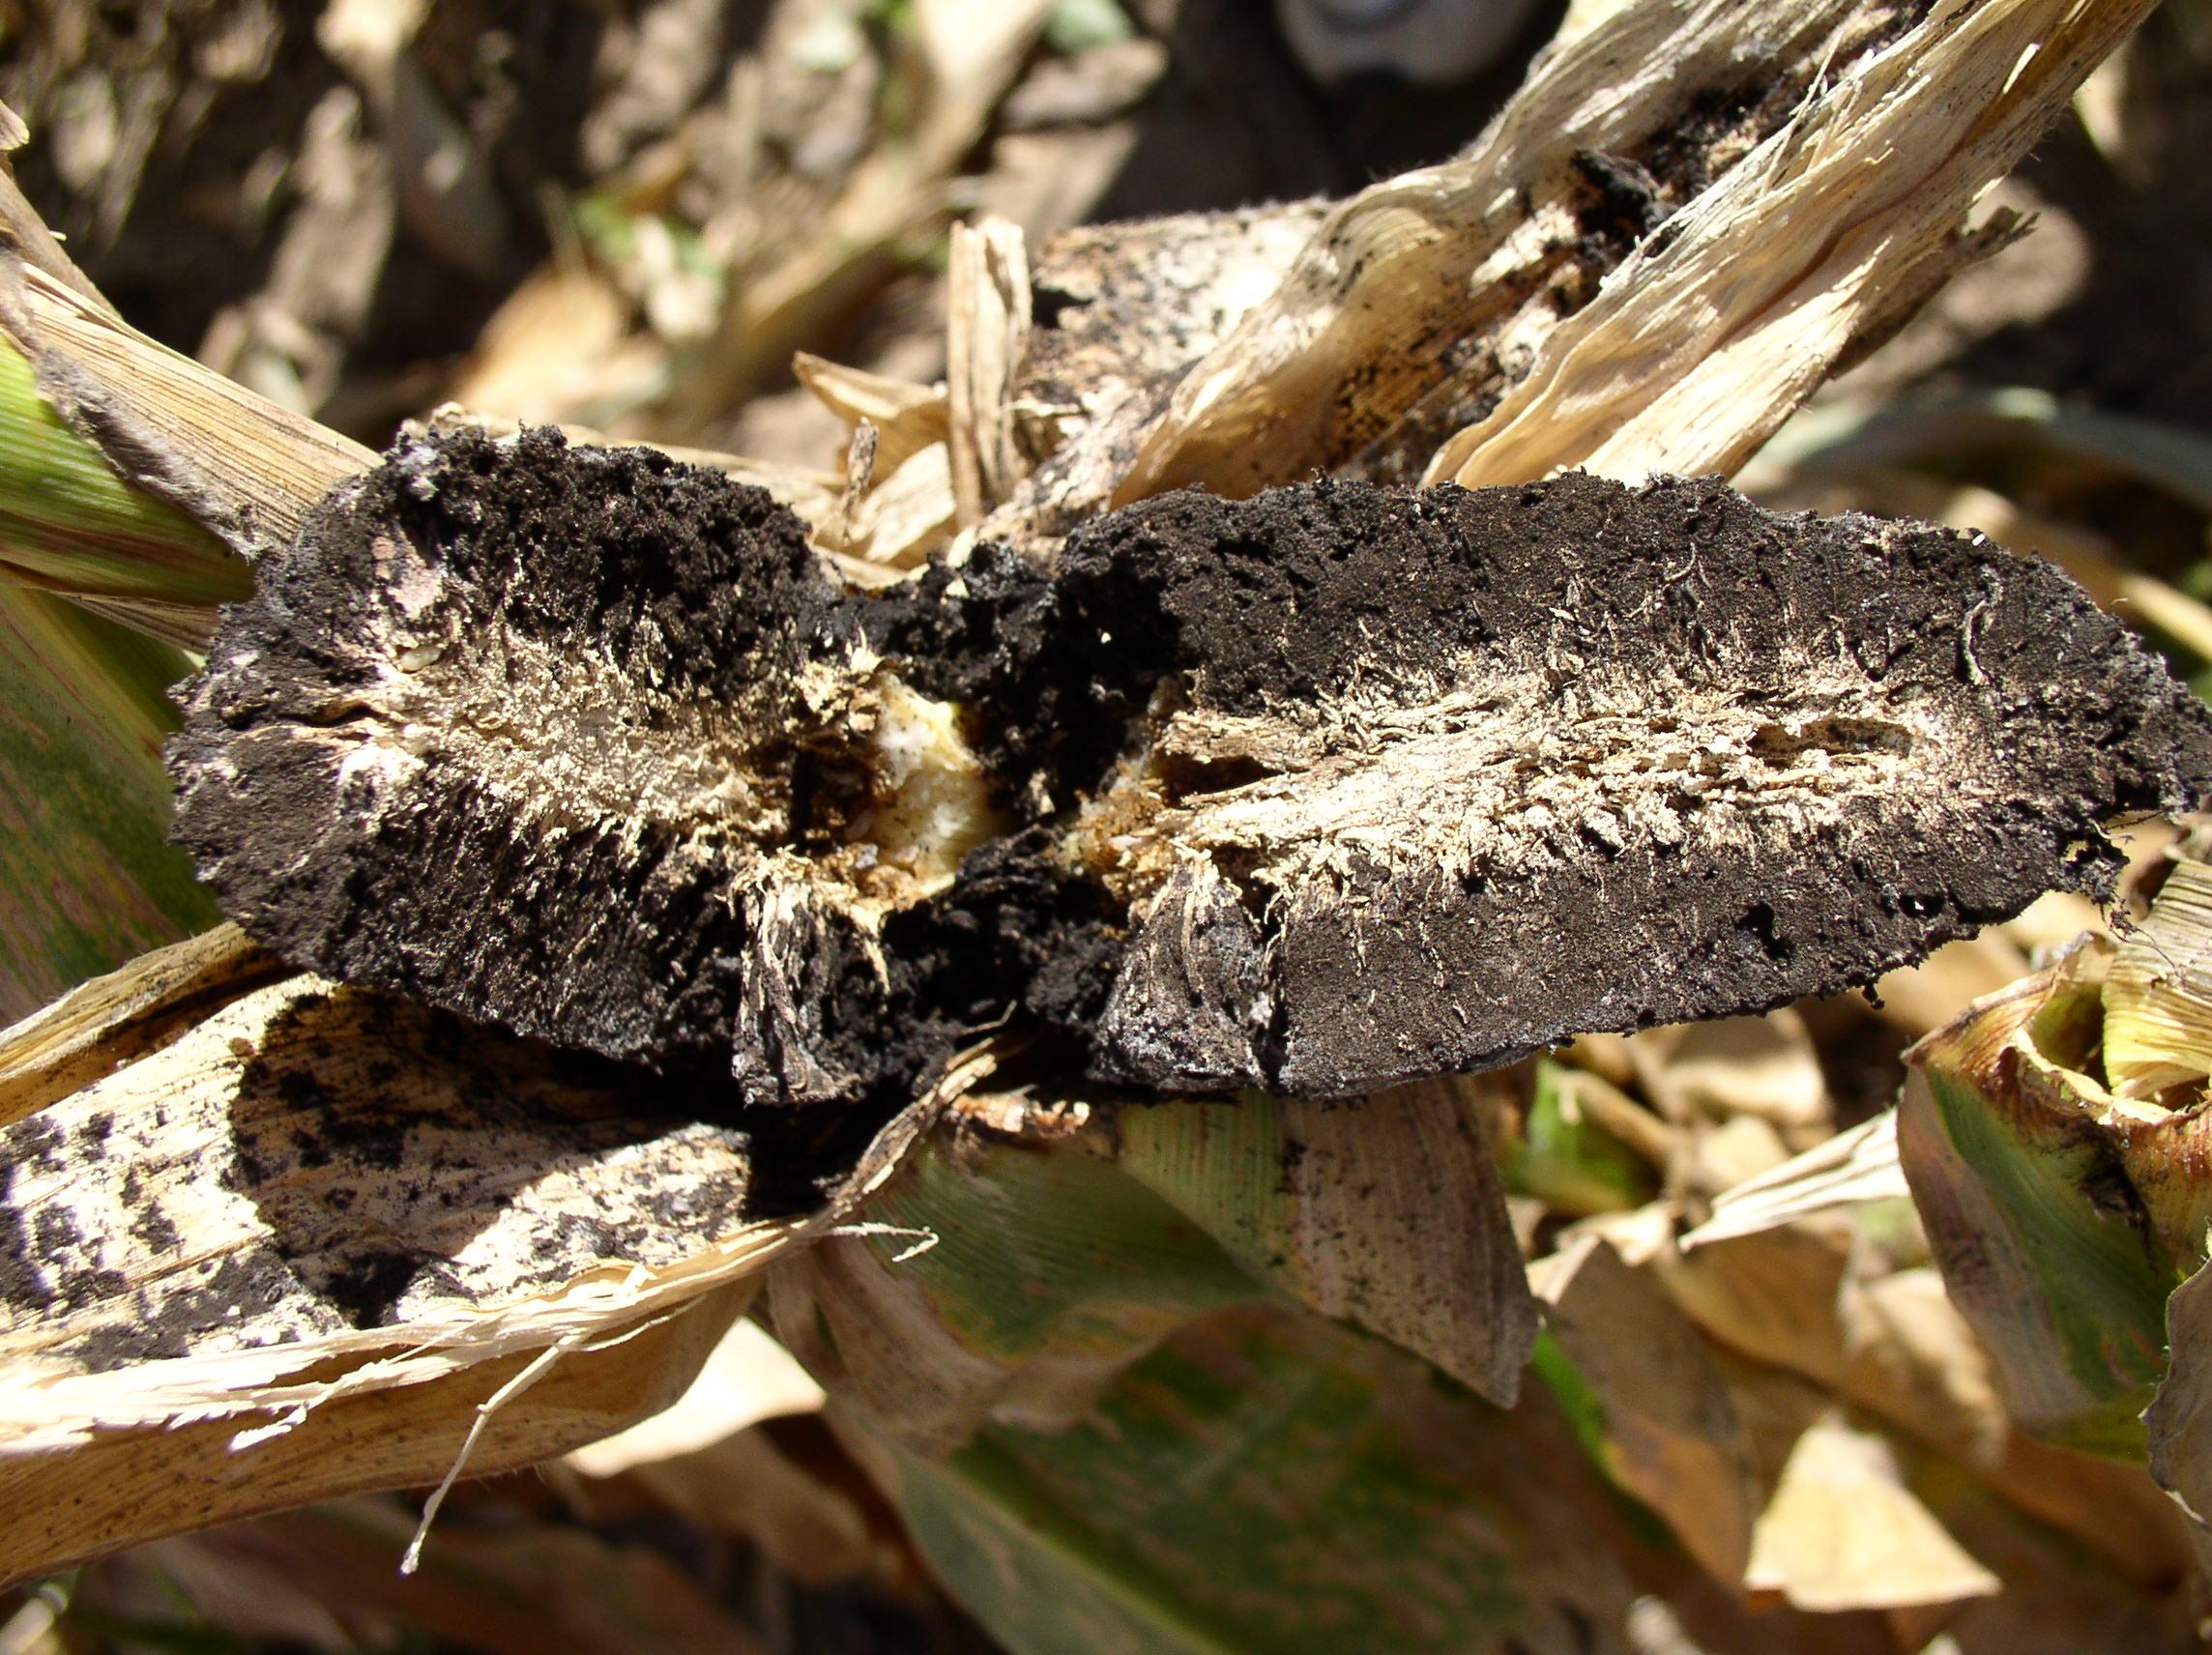 Ear split down the middle showing black spore masses.